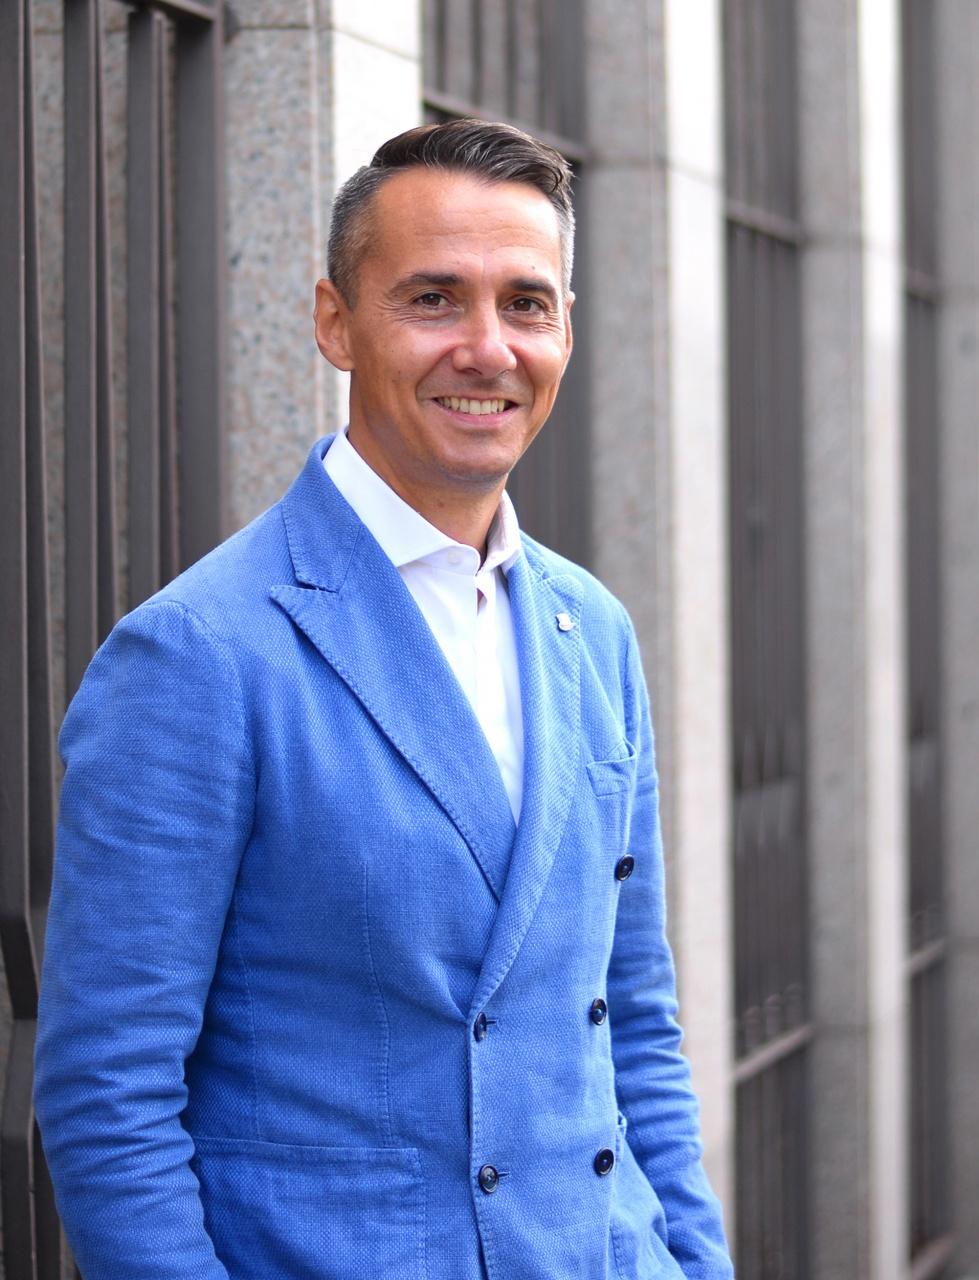 luca vismara, sales manager open market wiko italia